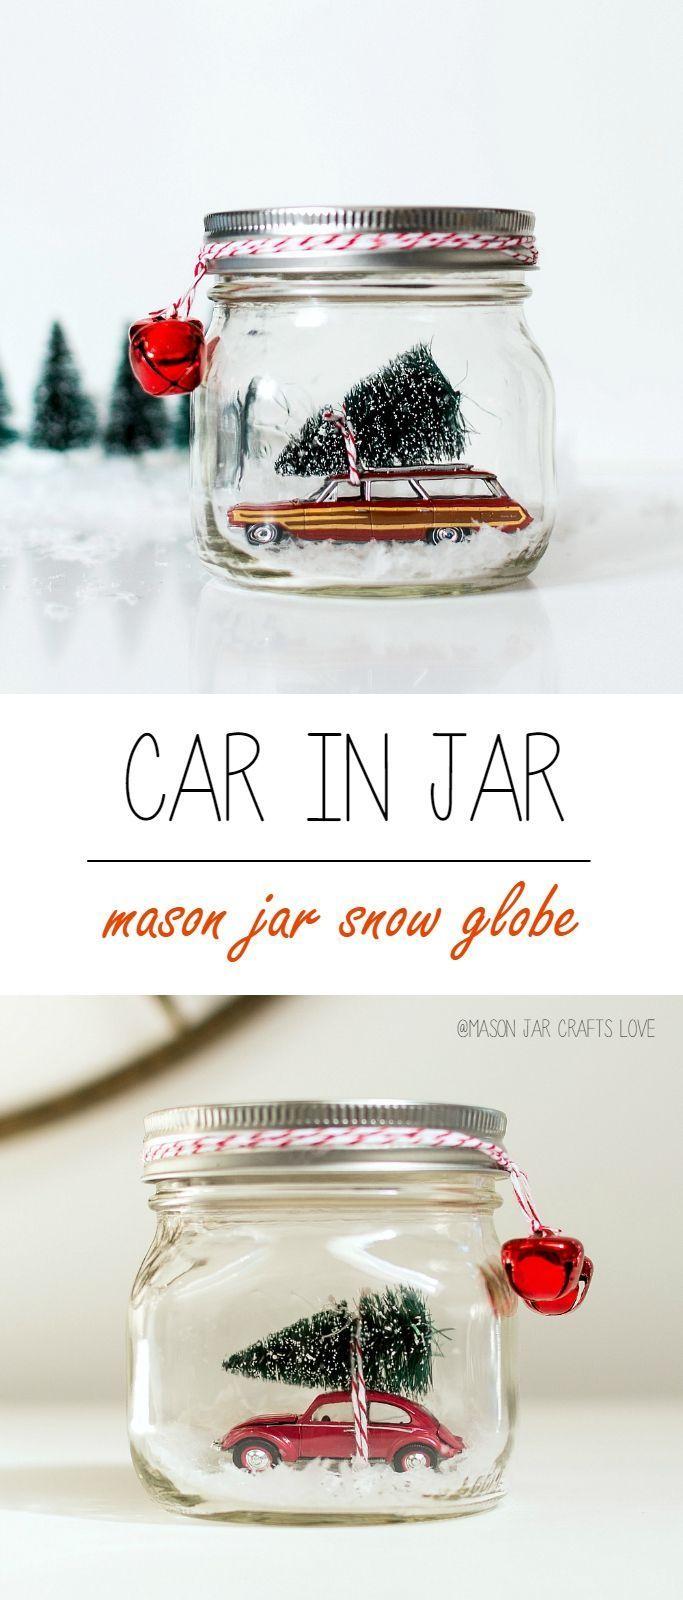 Car in Jar Snow Globe Diy Christmas